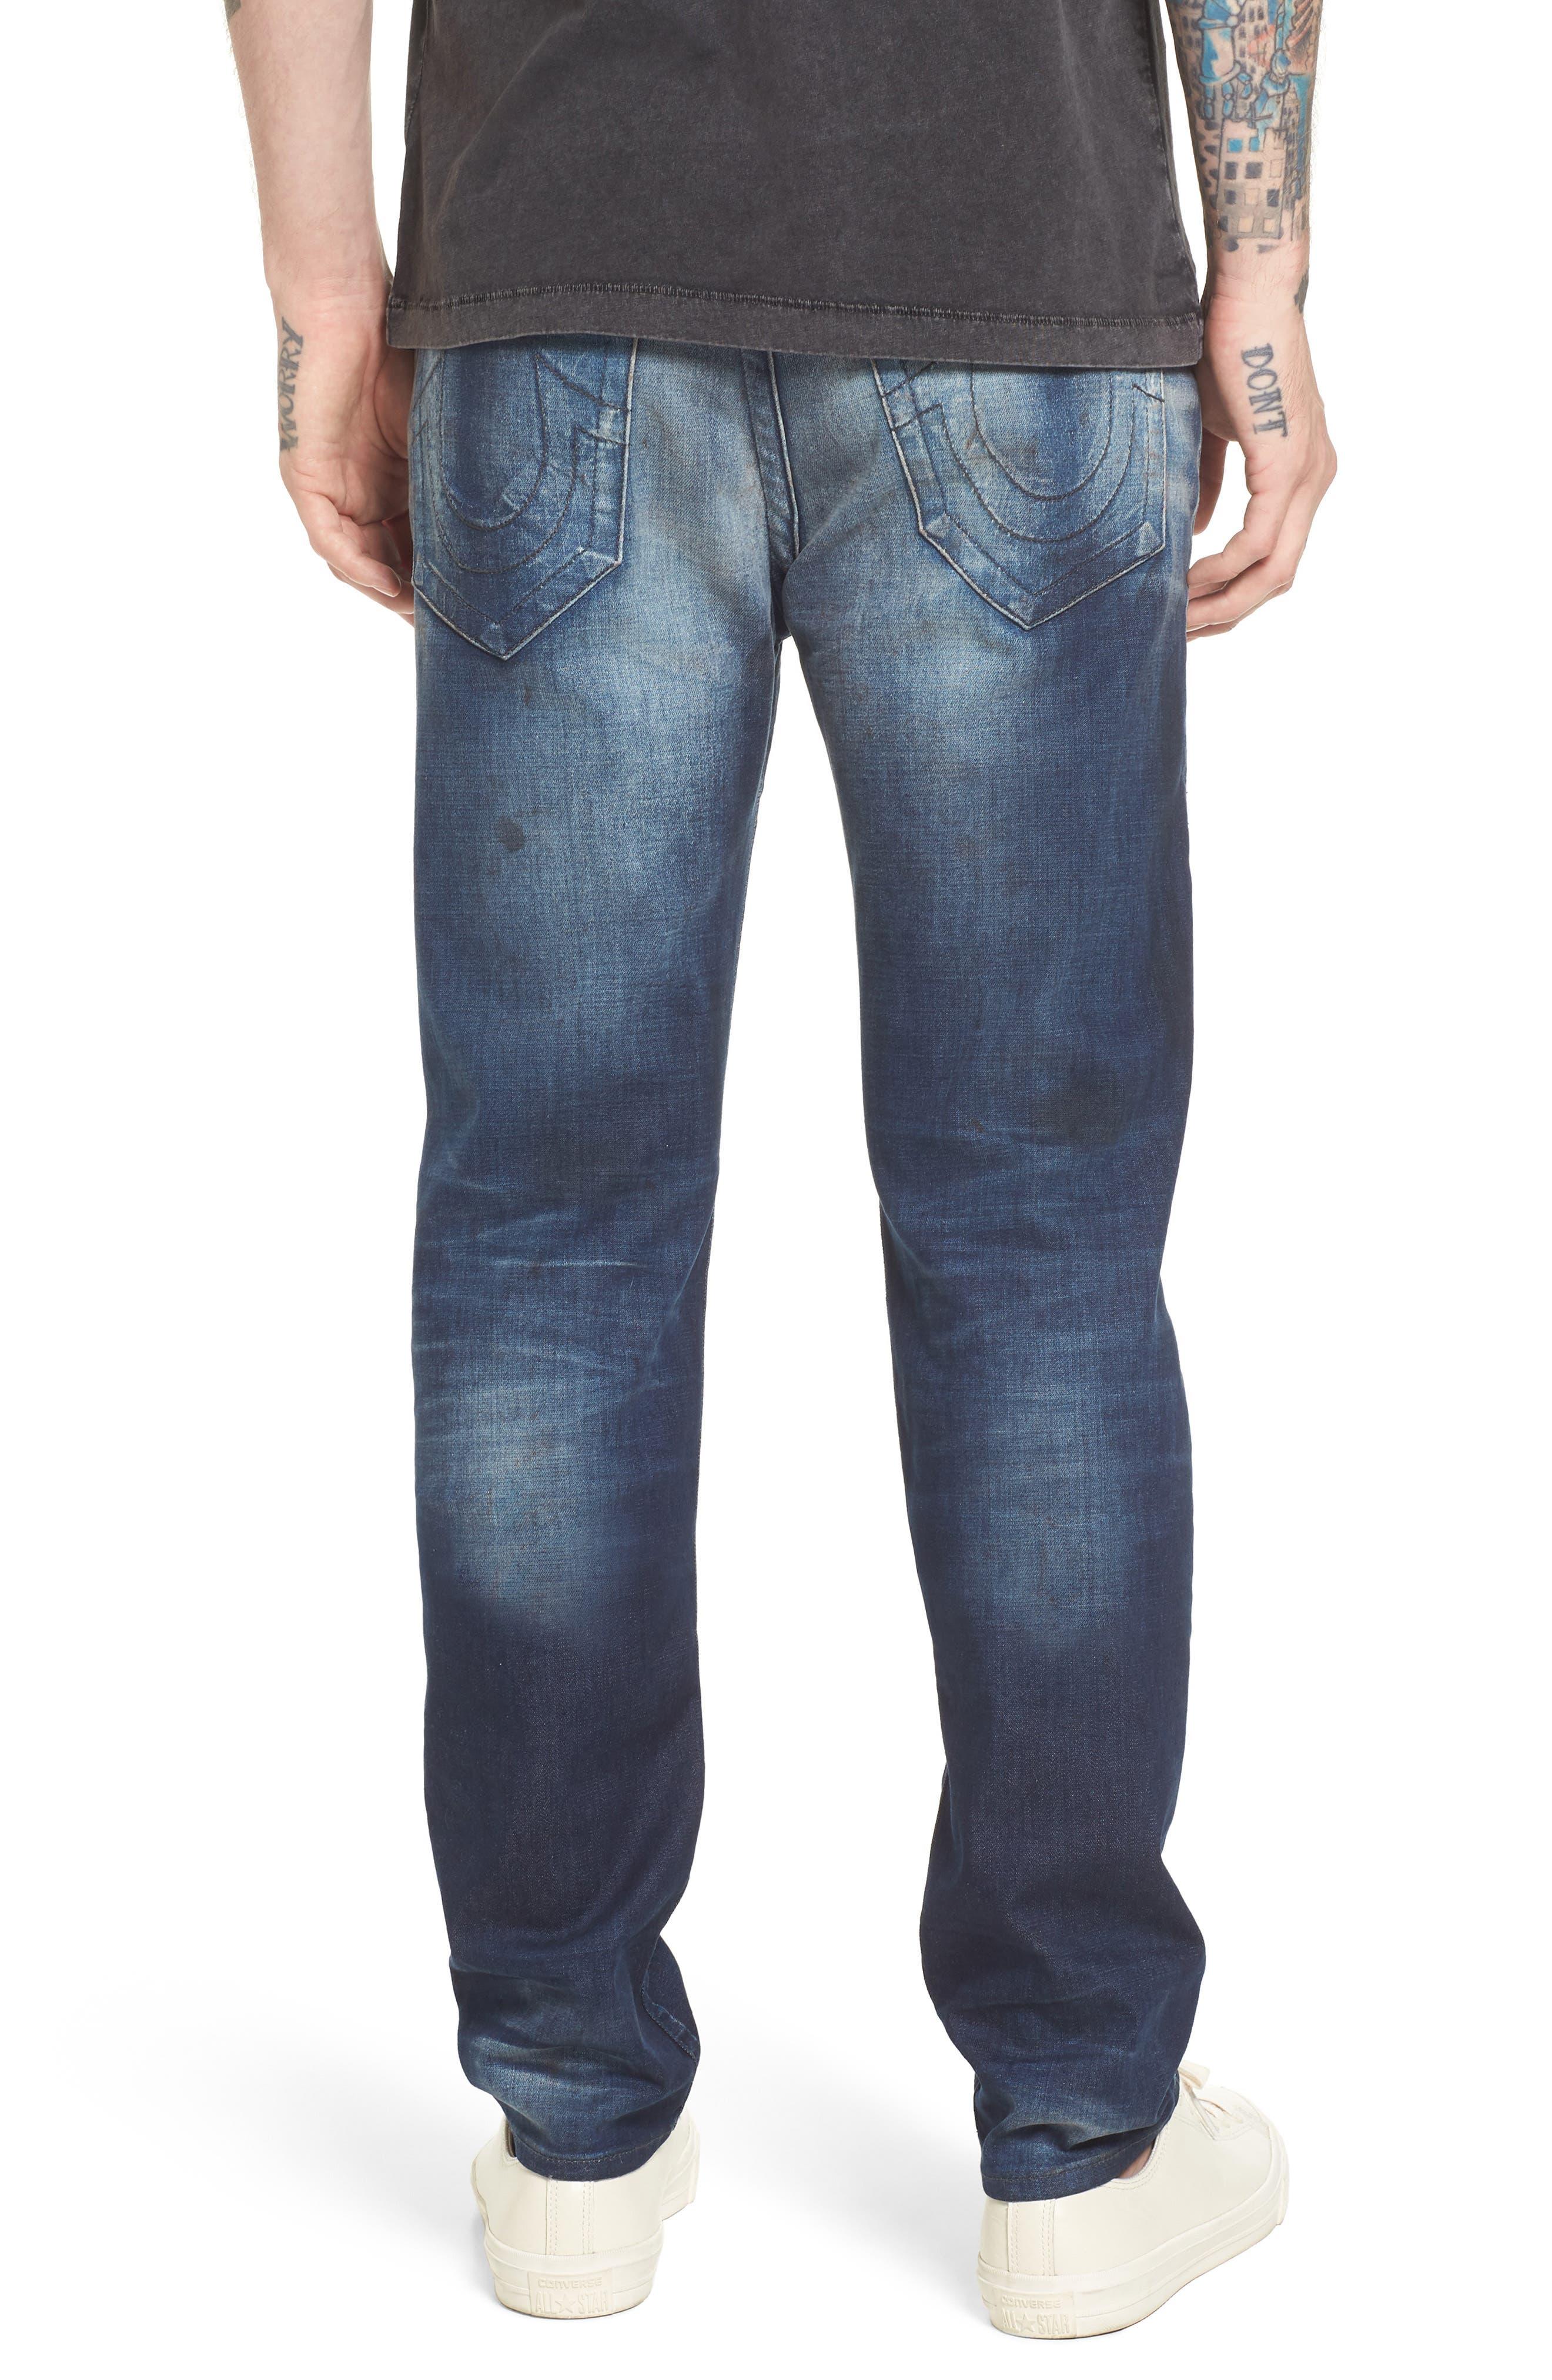 Rocco Skinny Fit Jeans,                             Alternate thumbnail 2, color,                             Loft Edge